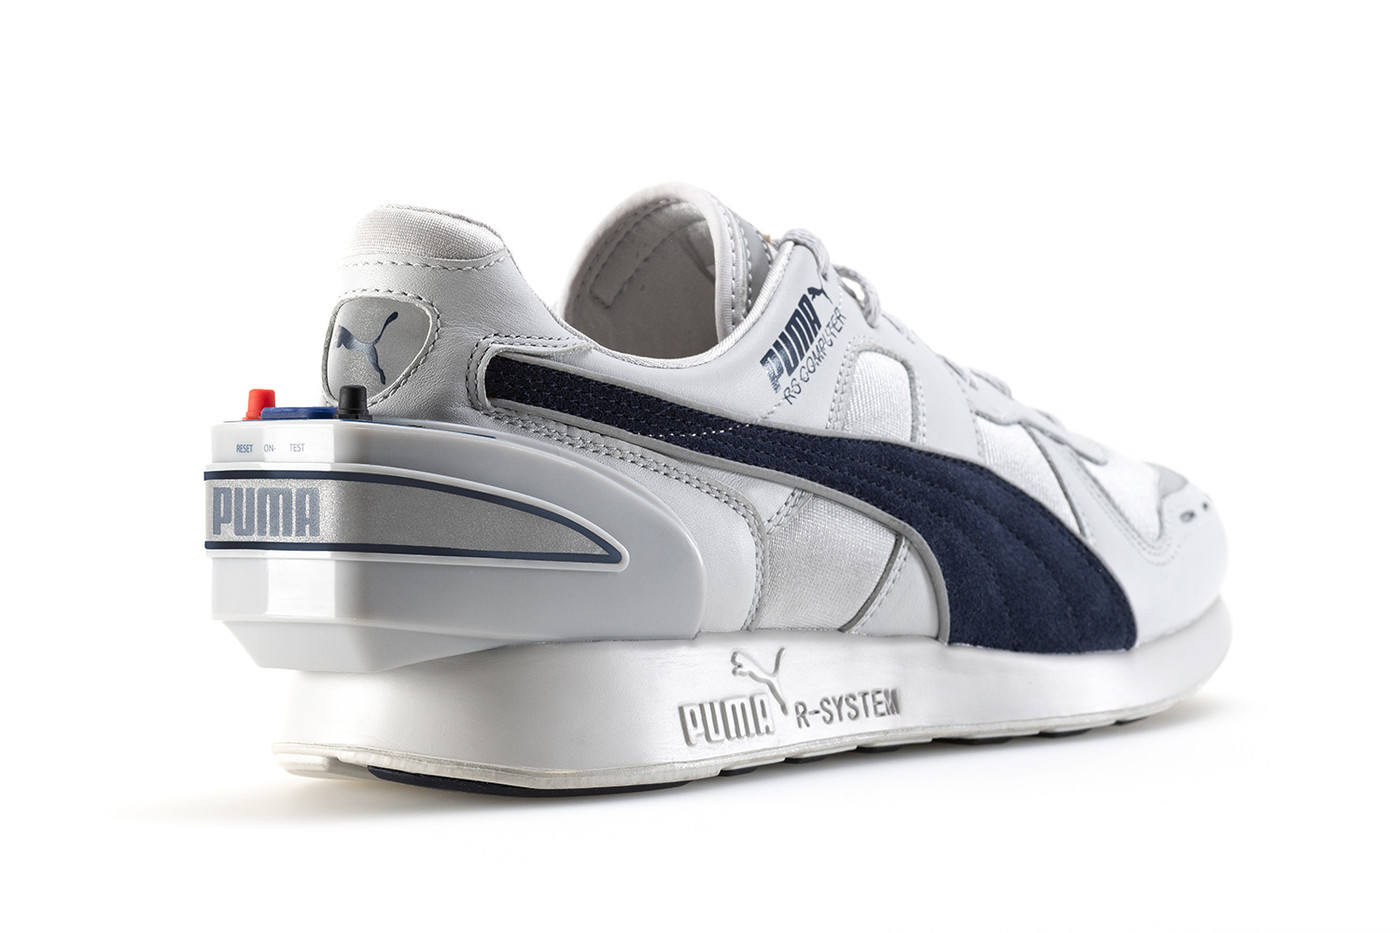 https: img.okezone.com content 2018 12 15 57 1991670 canggih-sepatu-ini-miliki-teknologi-smartwatch-aCEEaCr2hl.jpg